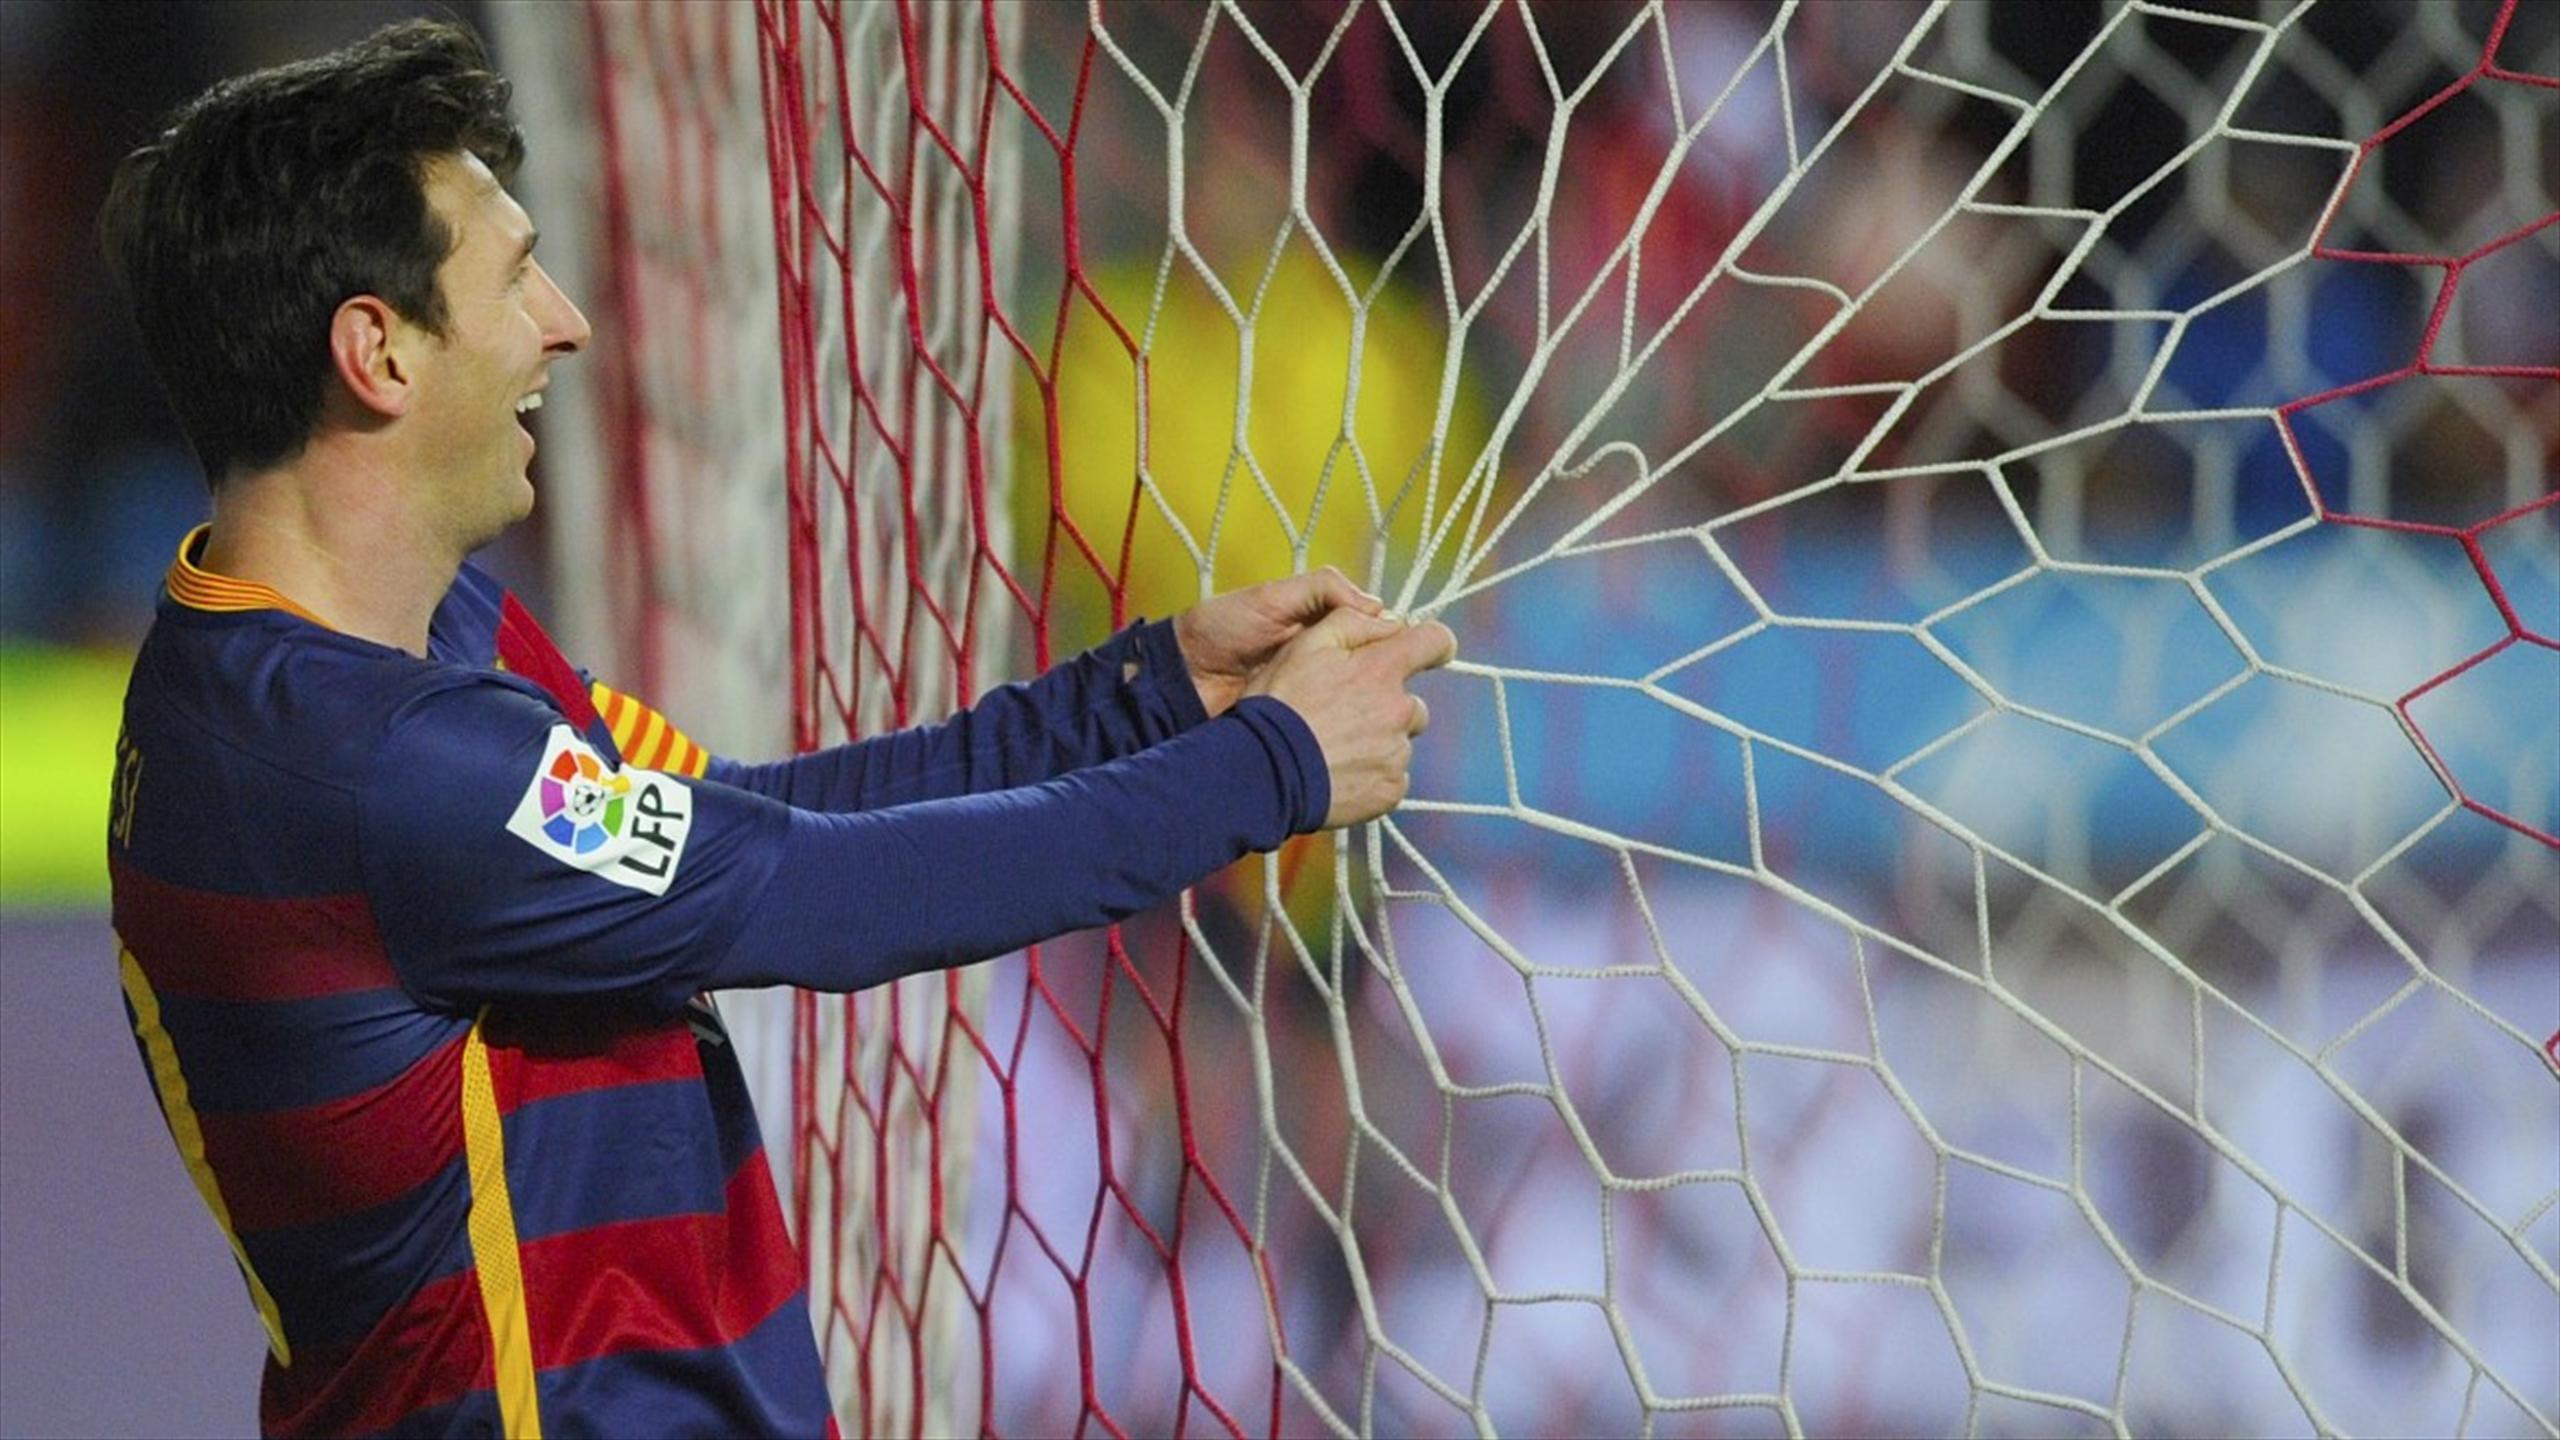 Video: Lionel Messi create history with his 300th La Liga goal for Barcelona